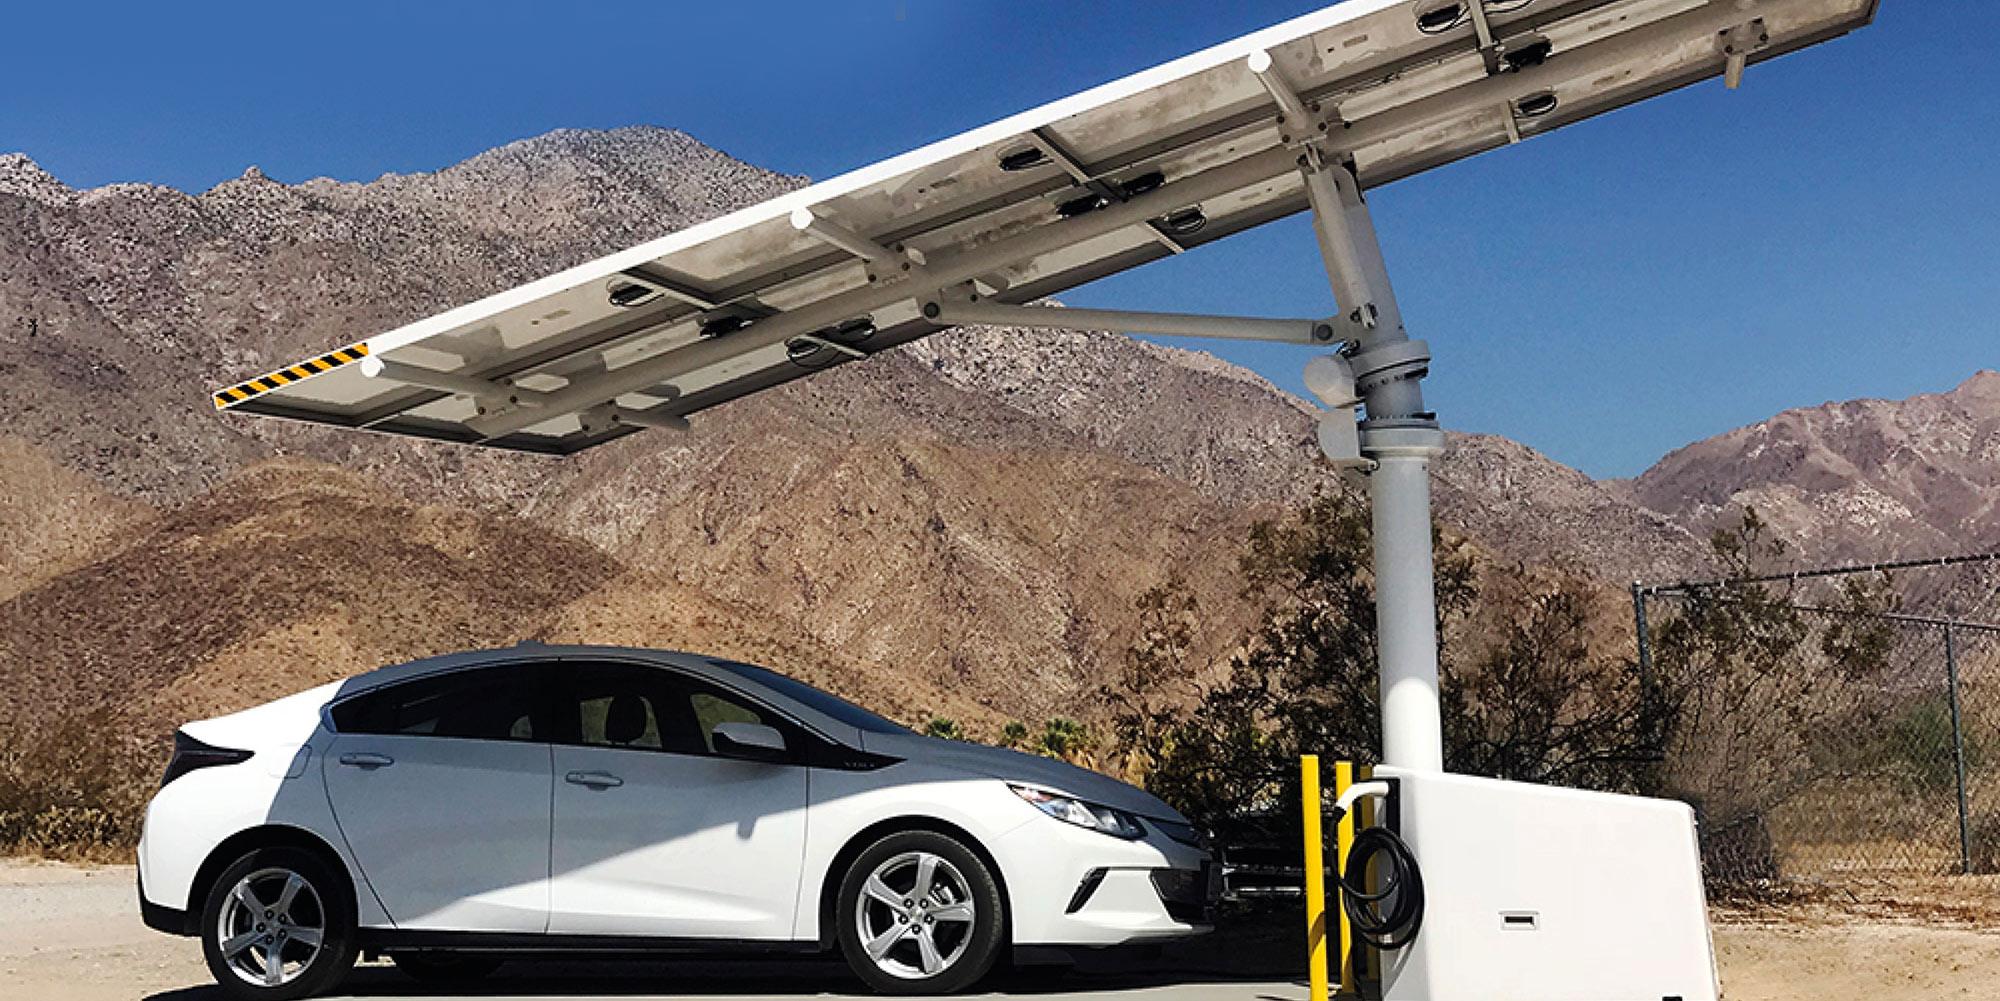 Envision off-grid solar EV charging